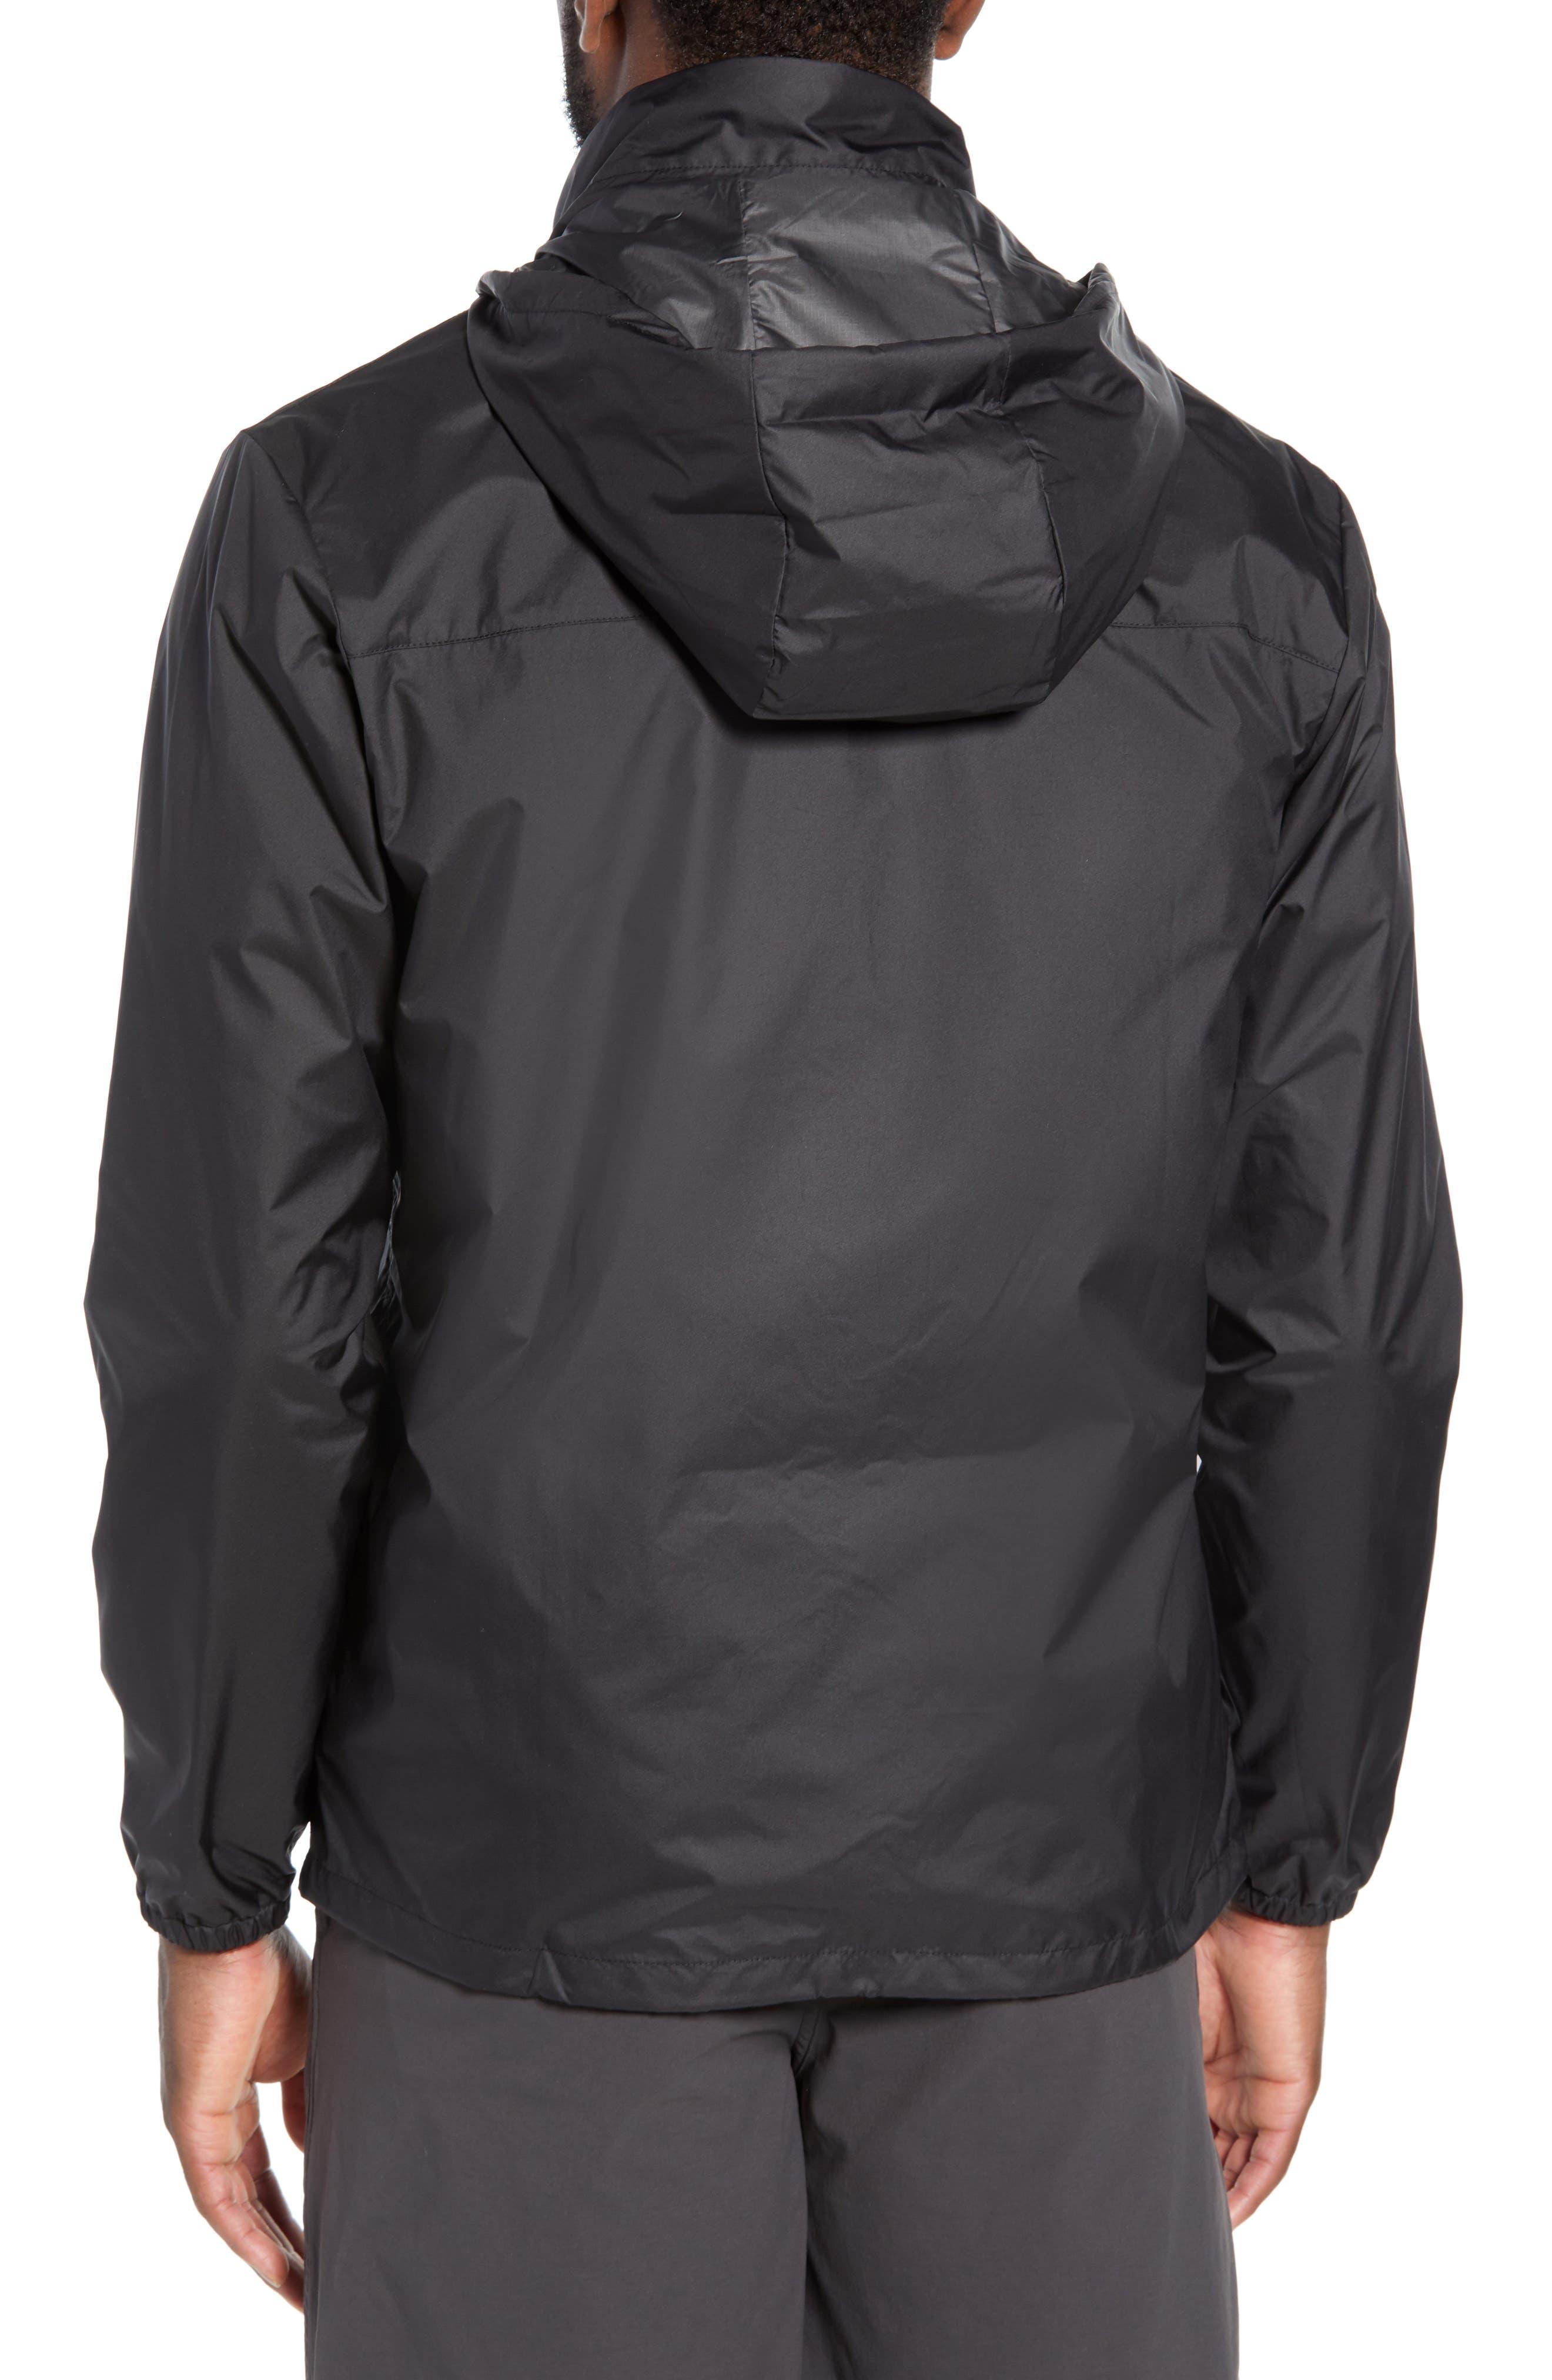 PATAGONIA, Light & Variable<sup>™</sup> Wind & Water Resistant Hooded Jacket, Alternate thumbnail 2, color, INK BLACK